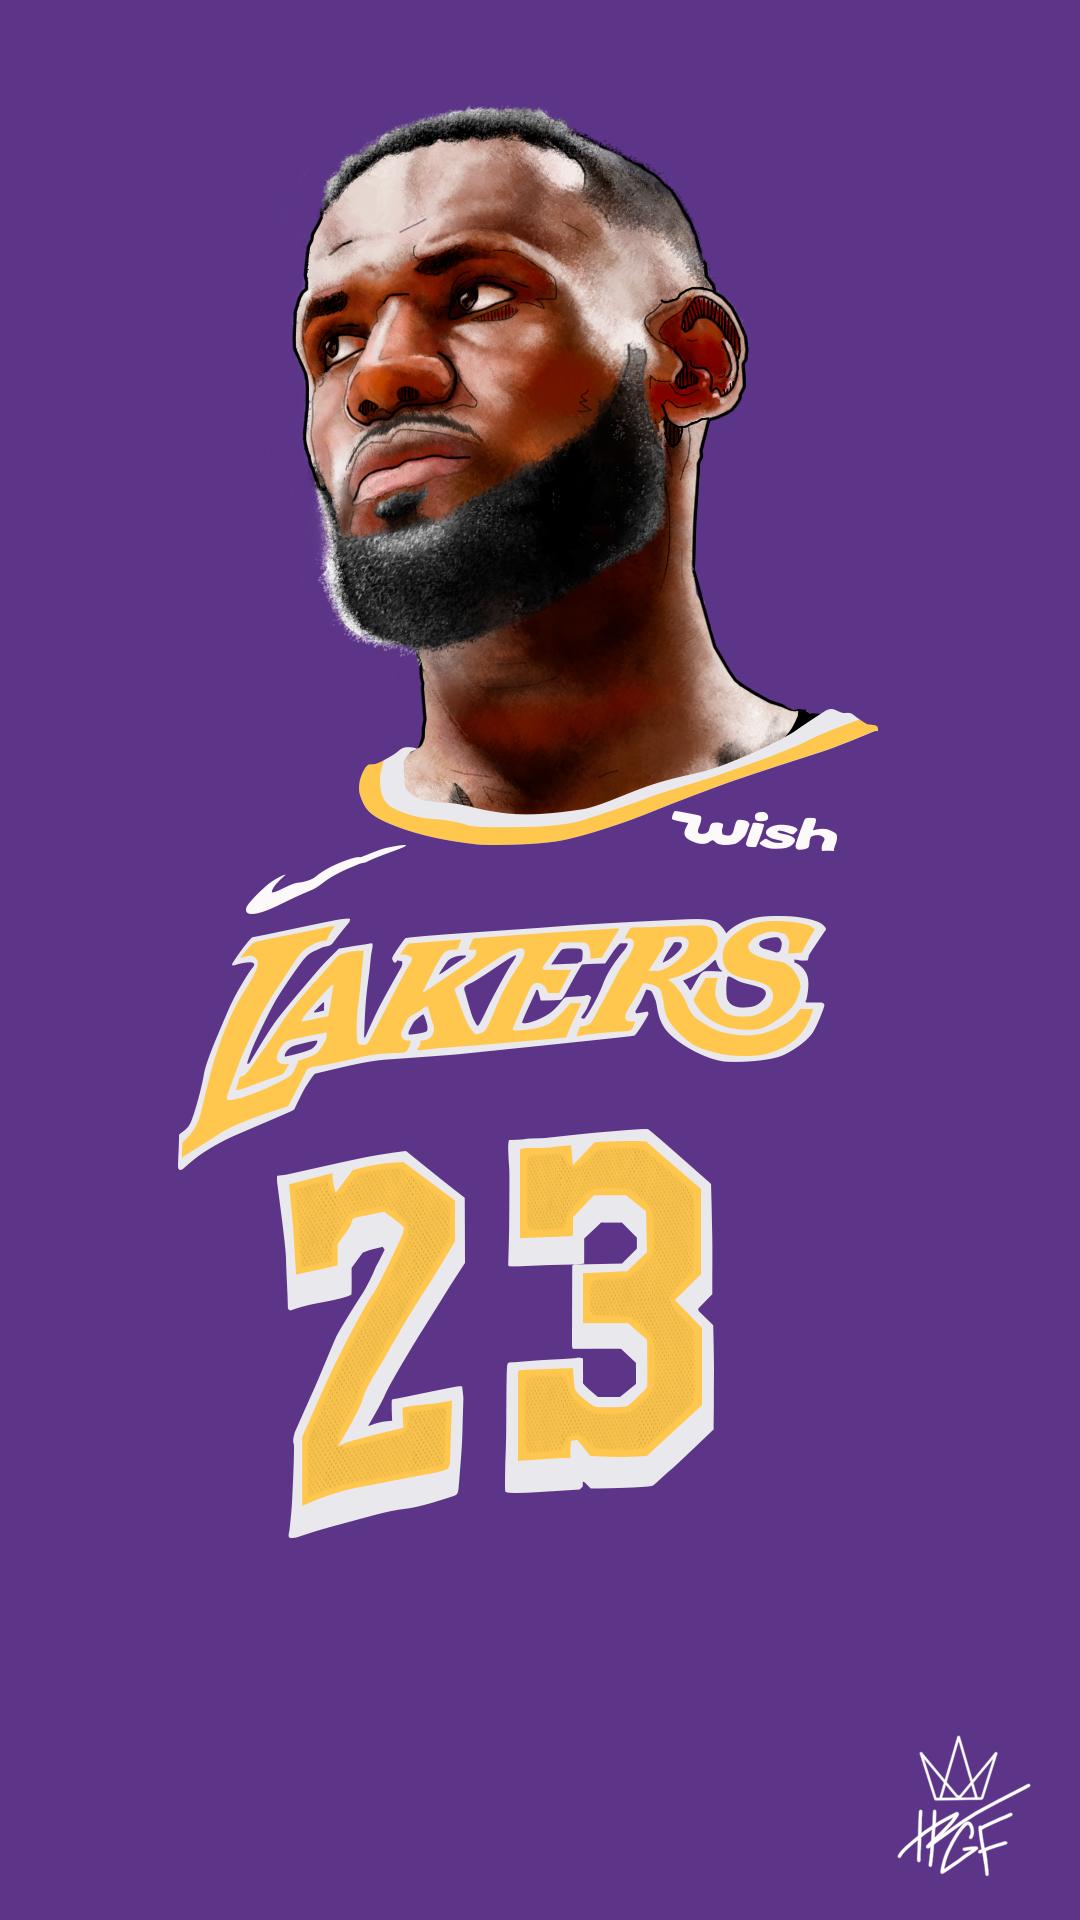 Lebron James Digital Artwork On Behance Lebron James Lakers Lebron James Background Lebron James